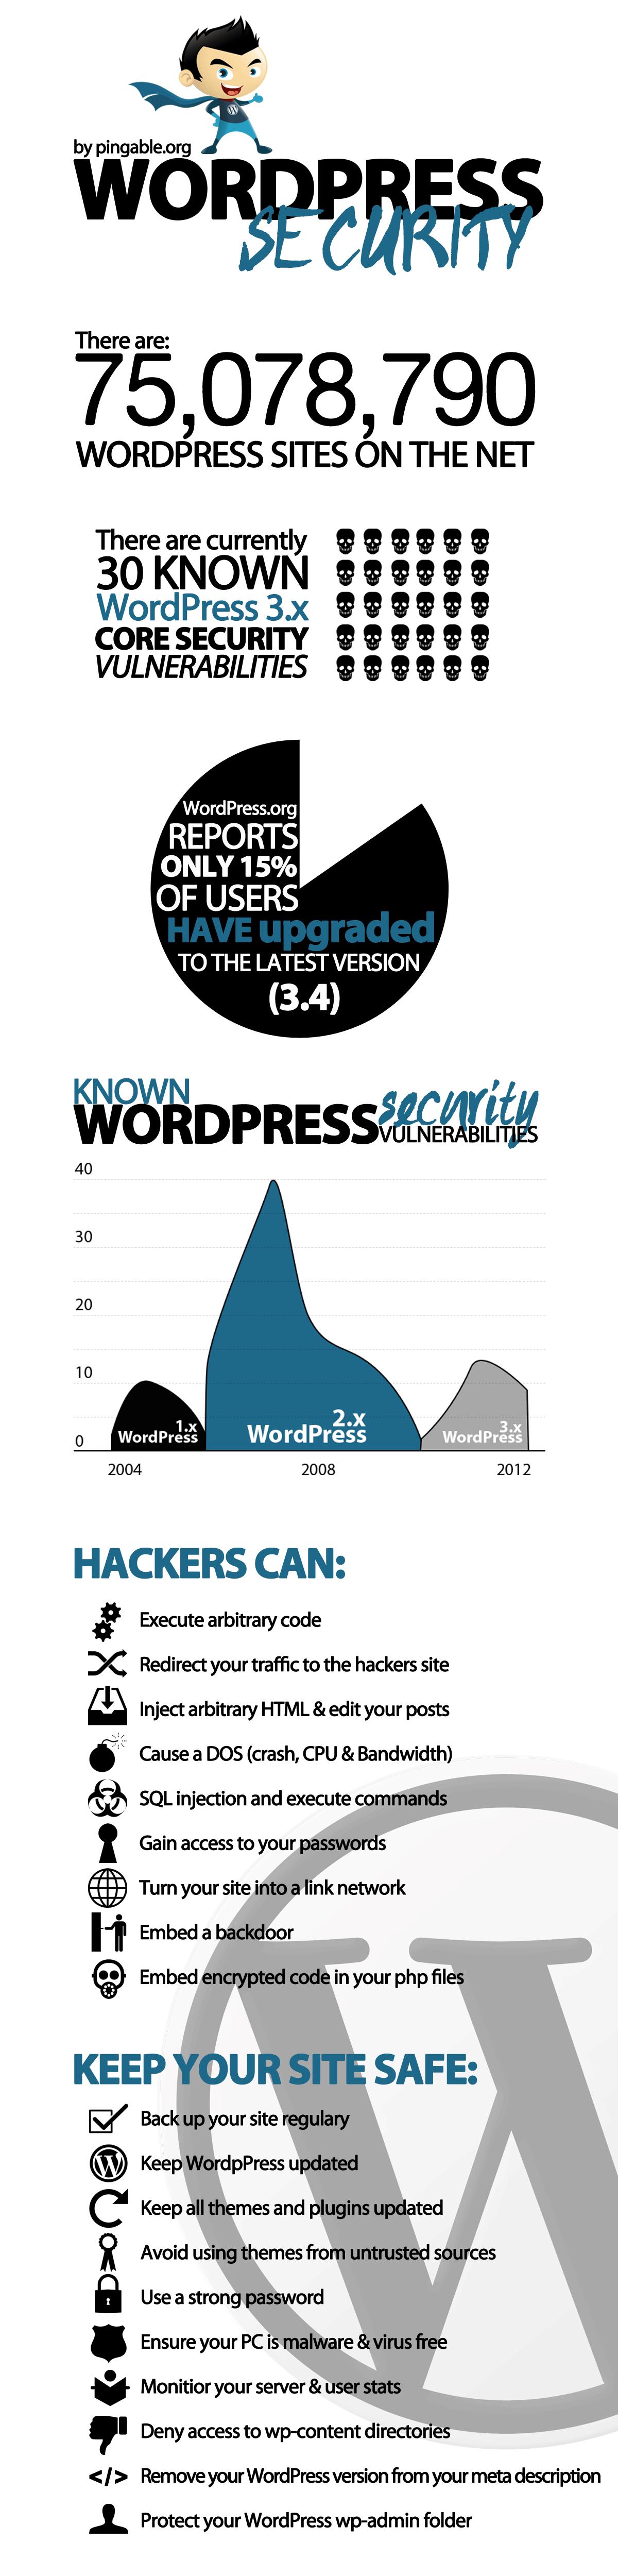 WordPress Security Inforgraphic - WordPress Security Tips